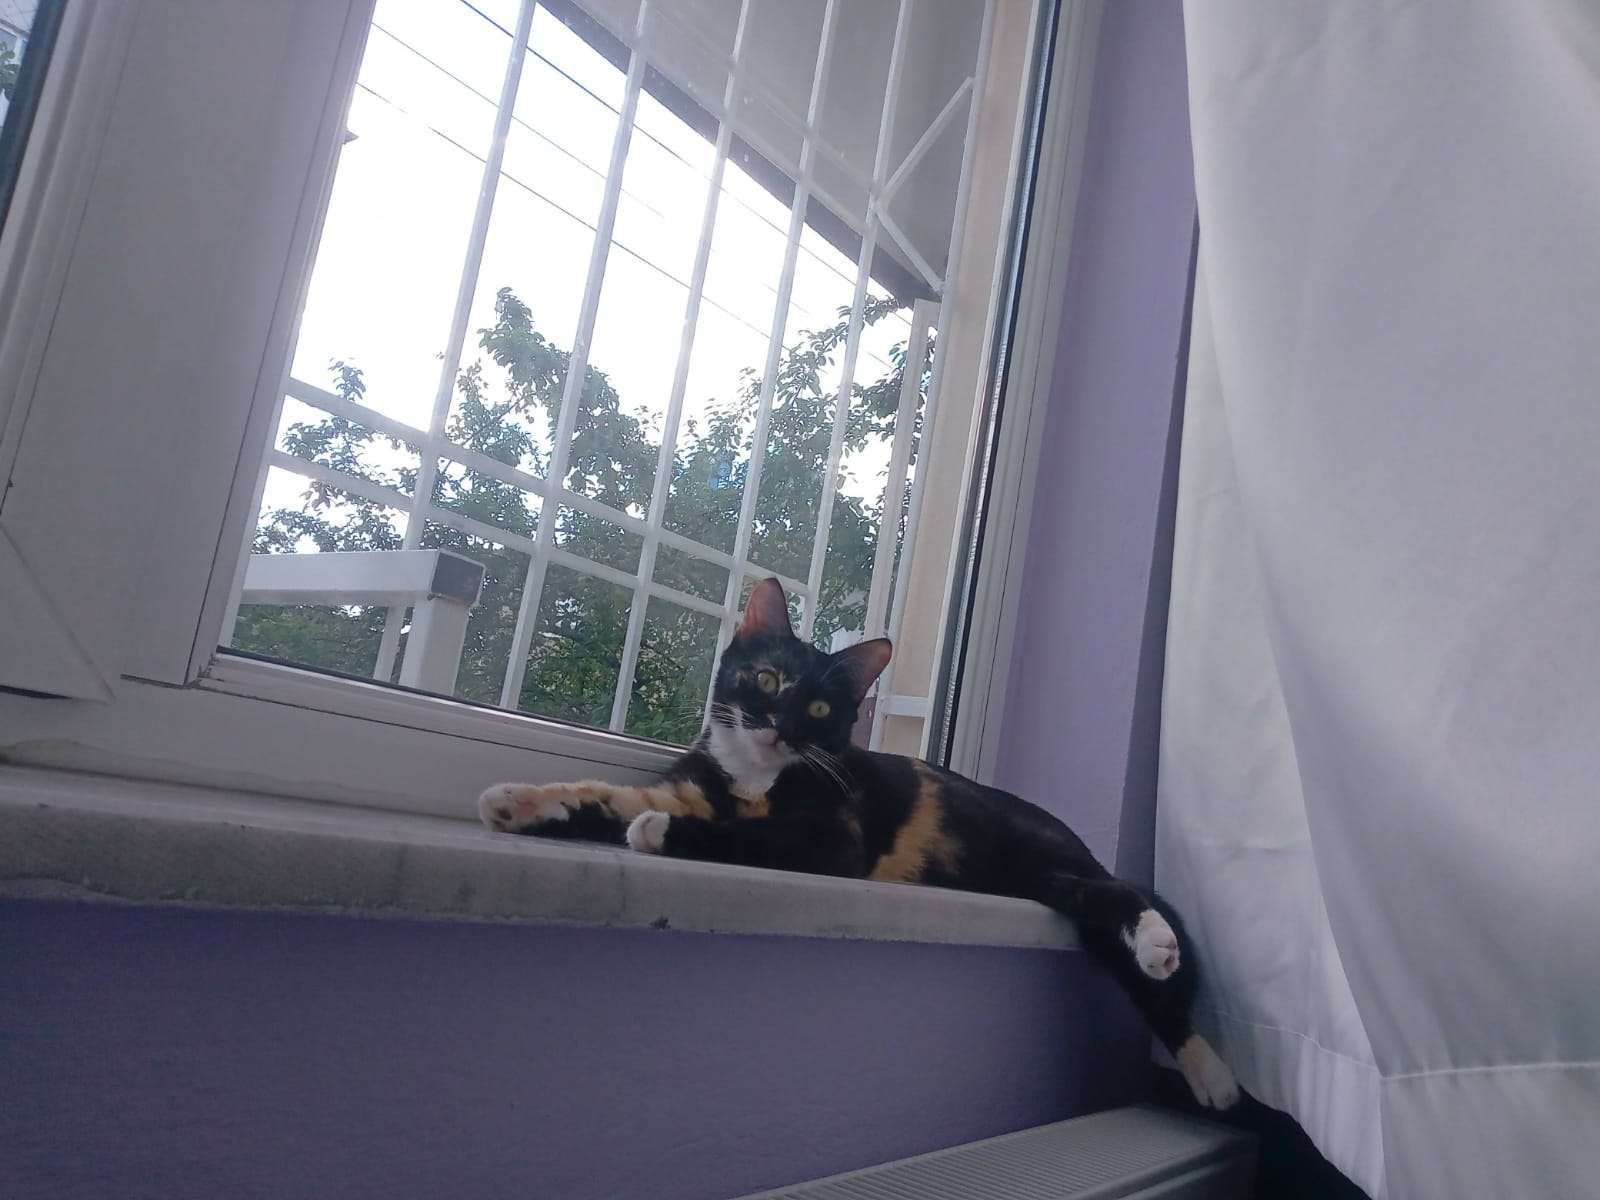 Malatya başharık kayıp kedi ilanı